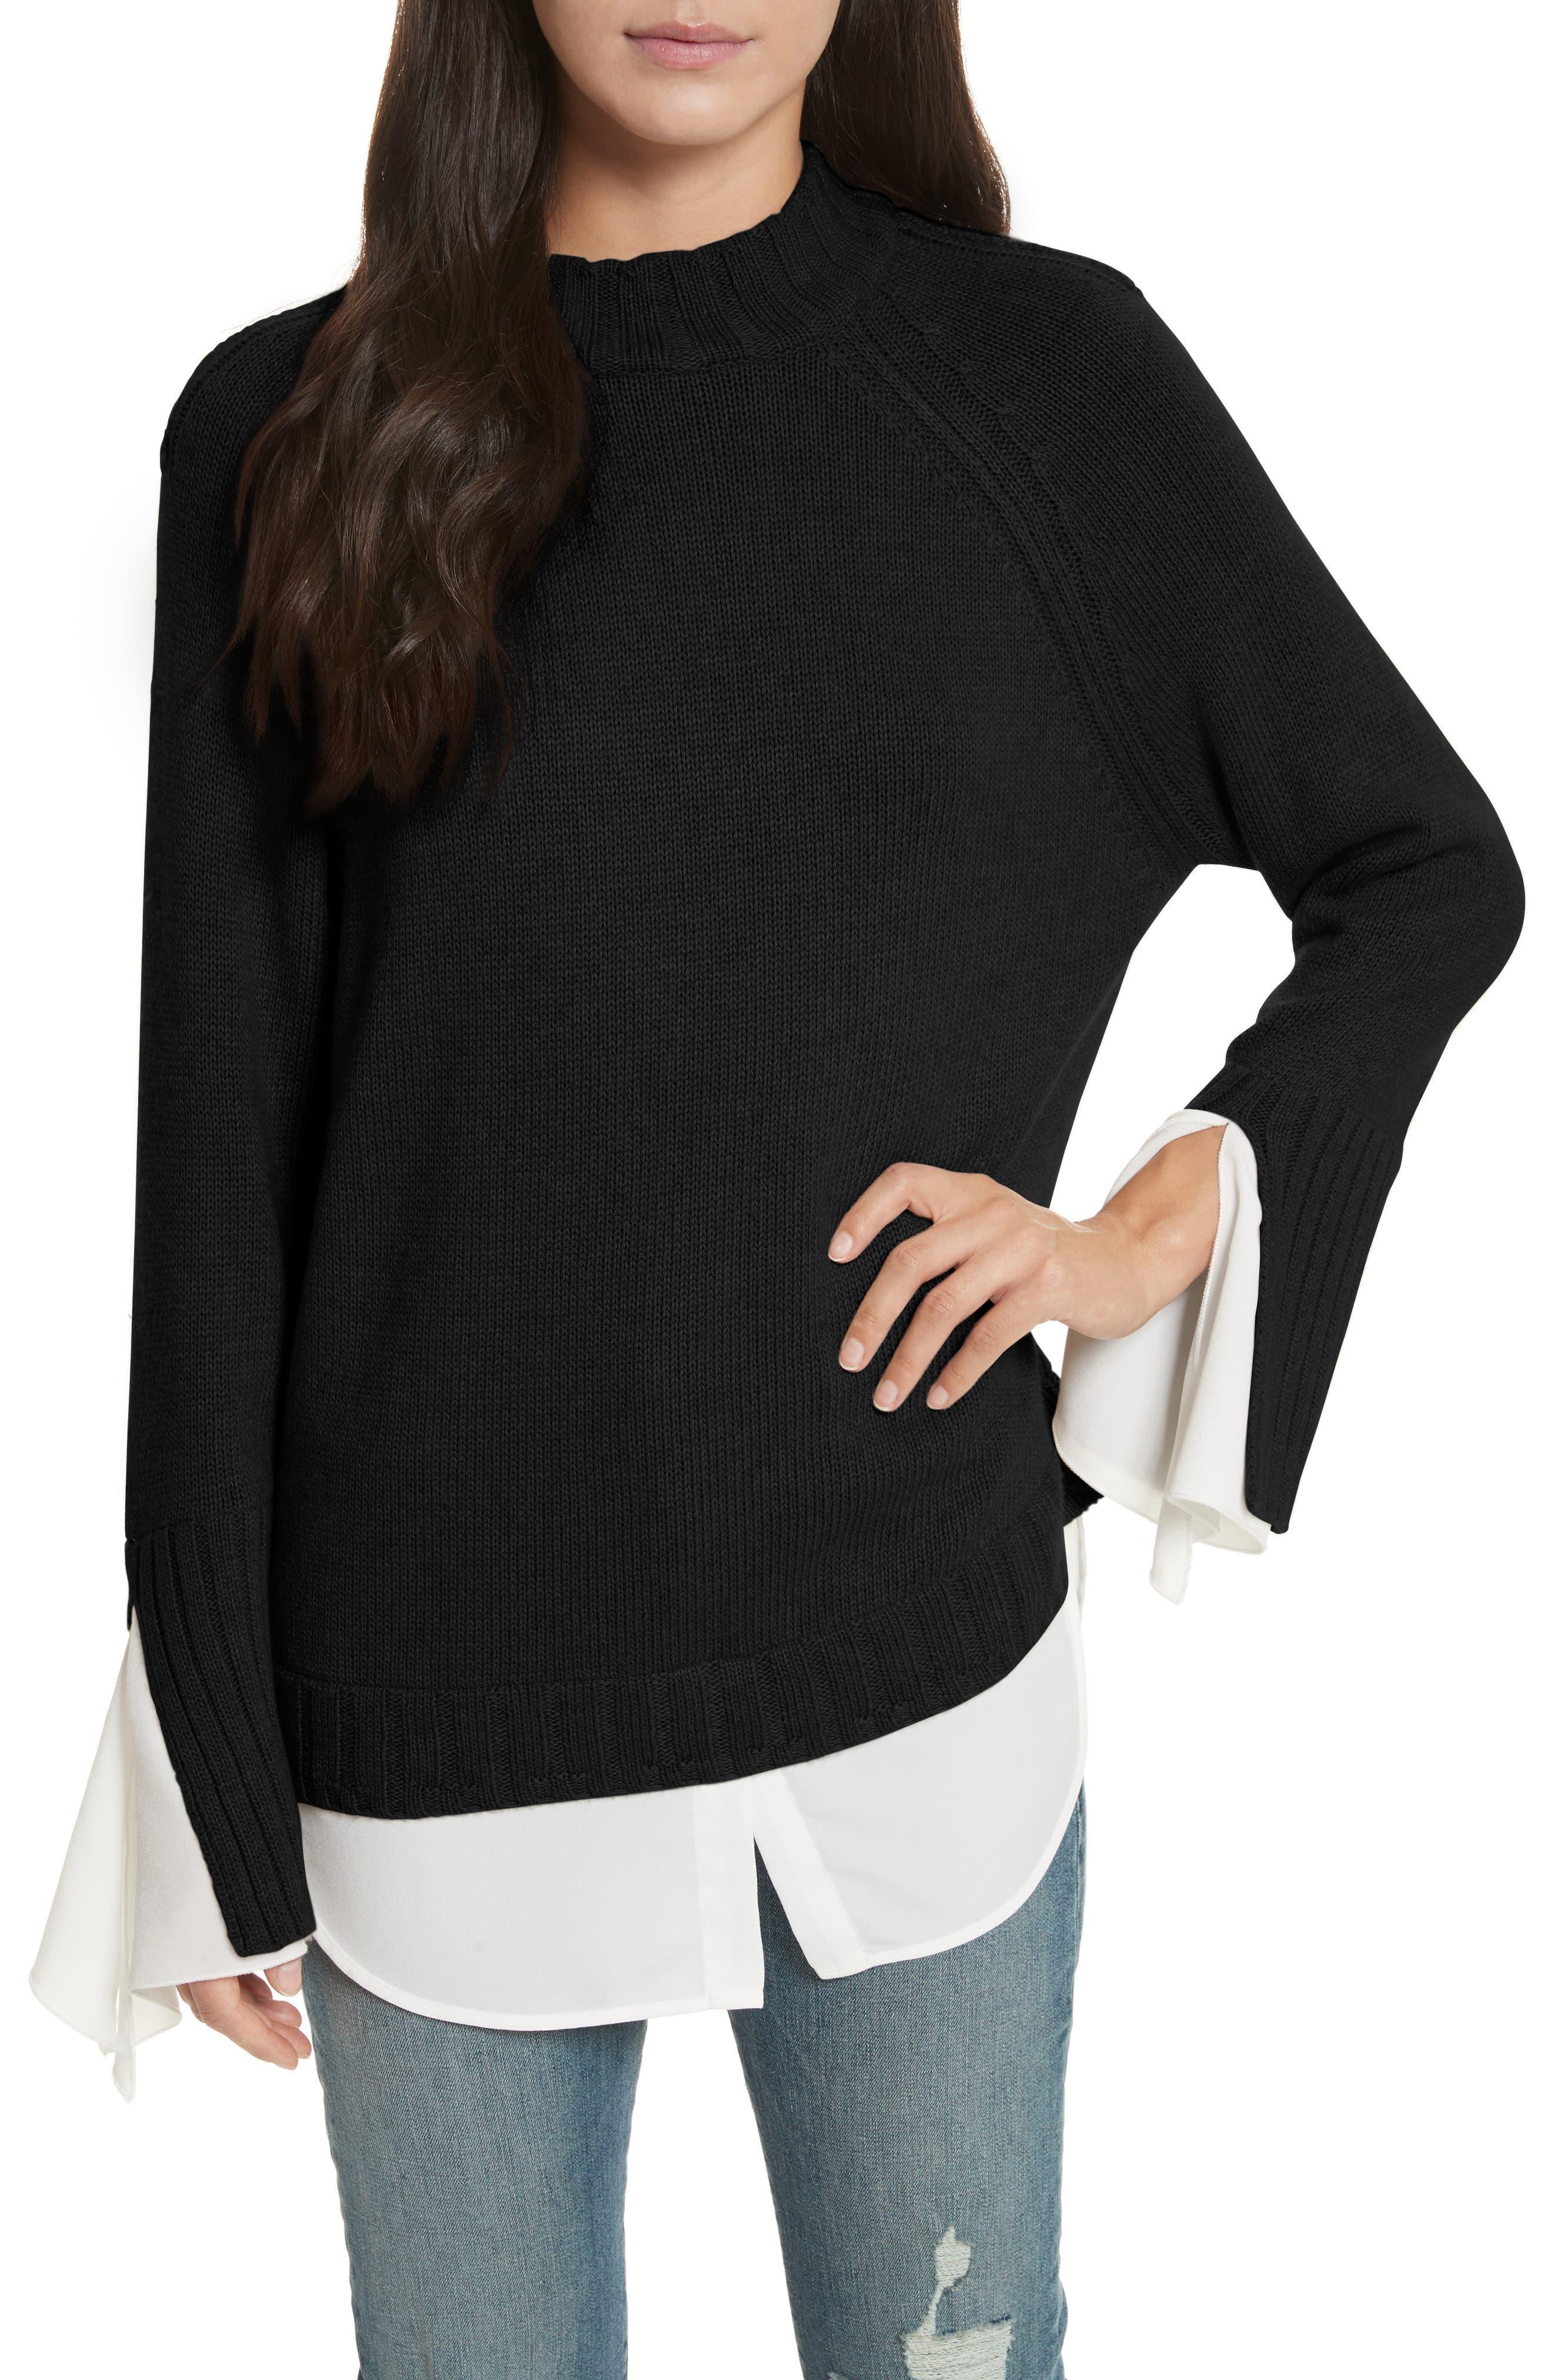 Remi Layered Pullover,                             Main thumbnail 1, color,                             002